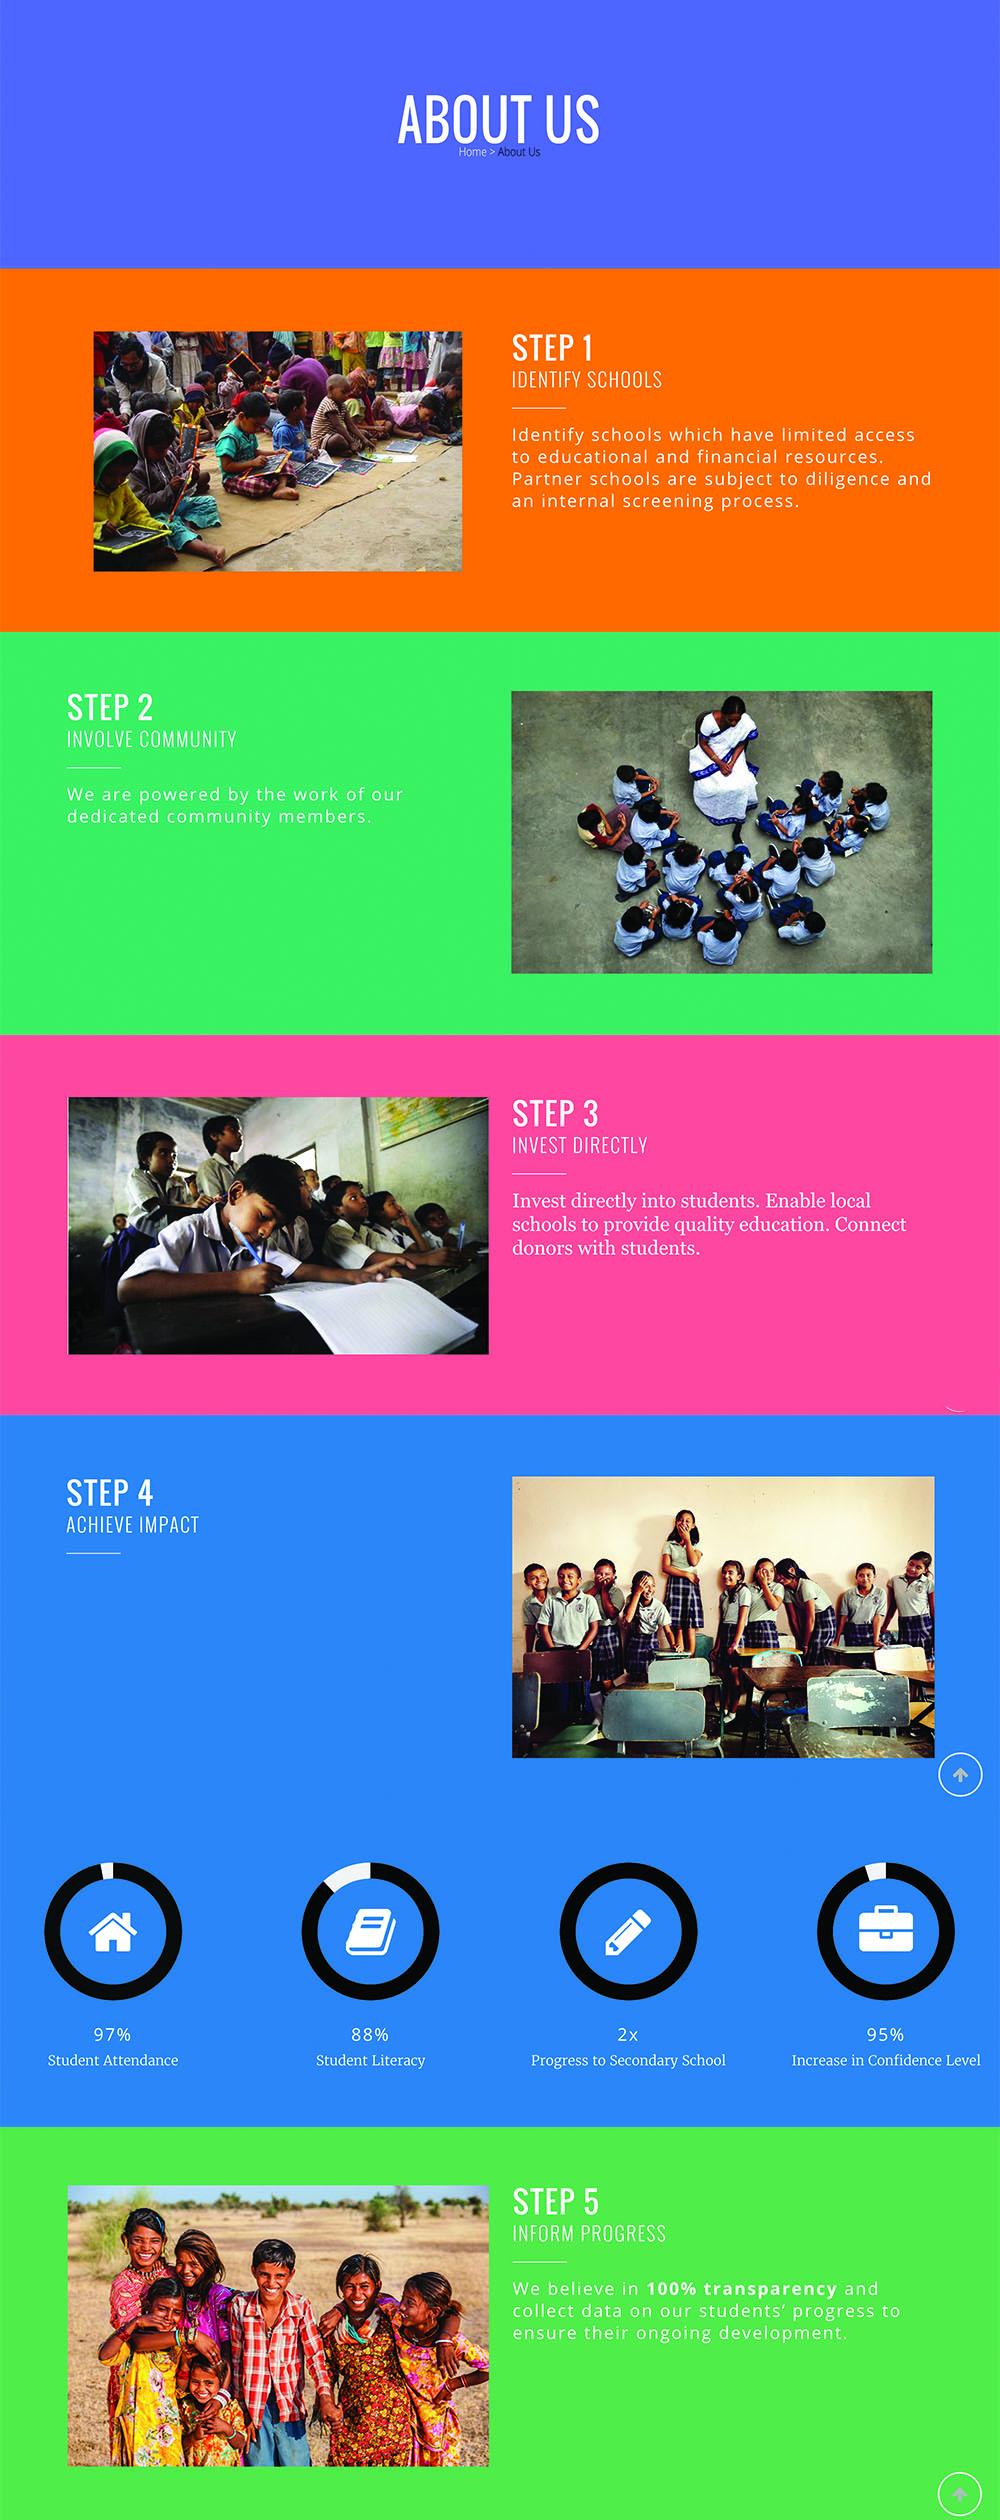 About Page Stitch.jpg